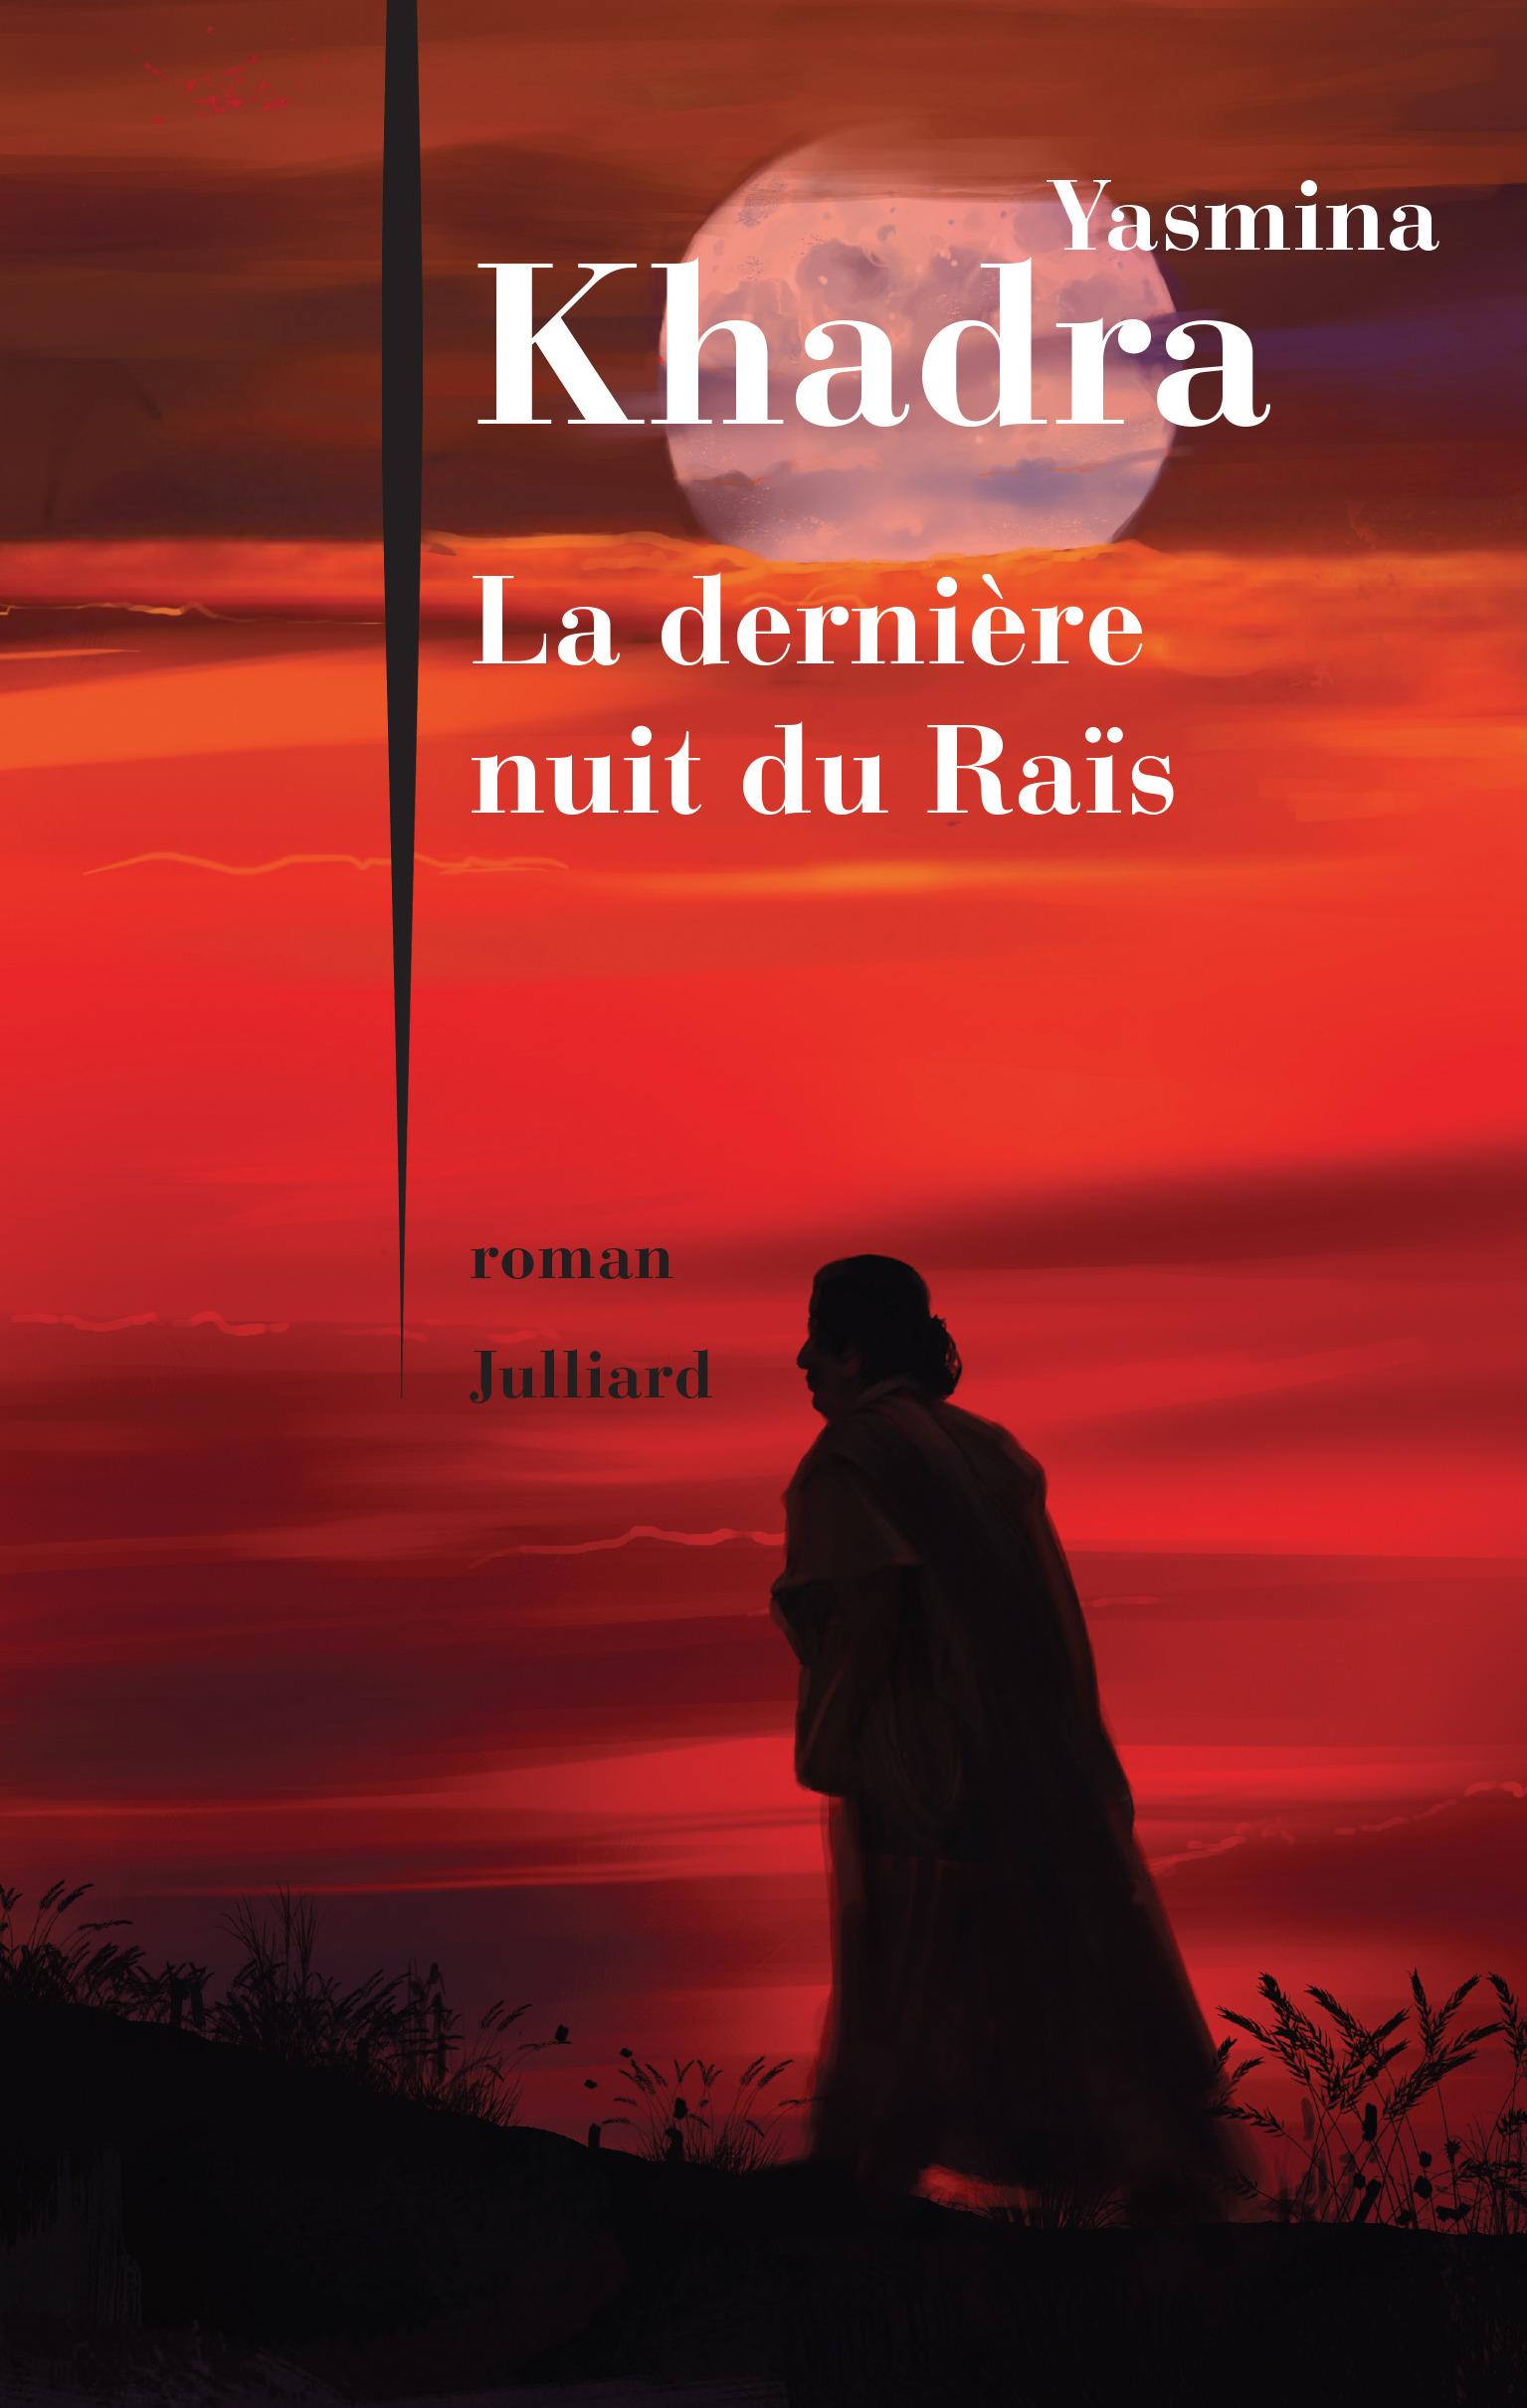 Le nouveau roman de Yasmina Khadra, maintenant en librairie!